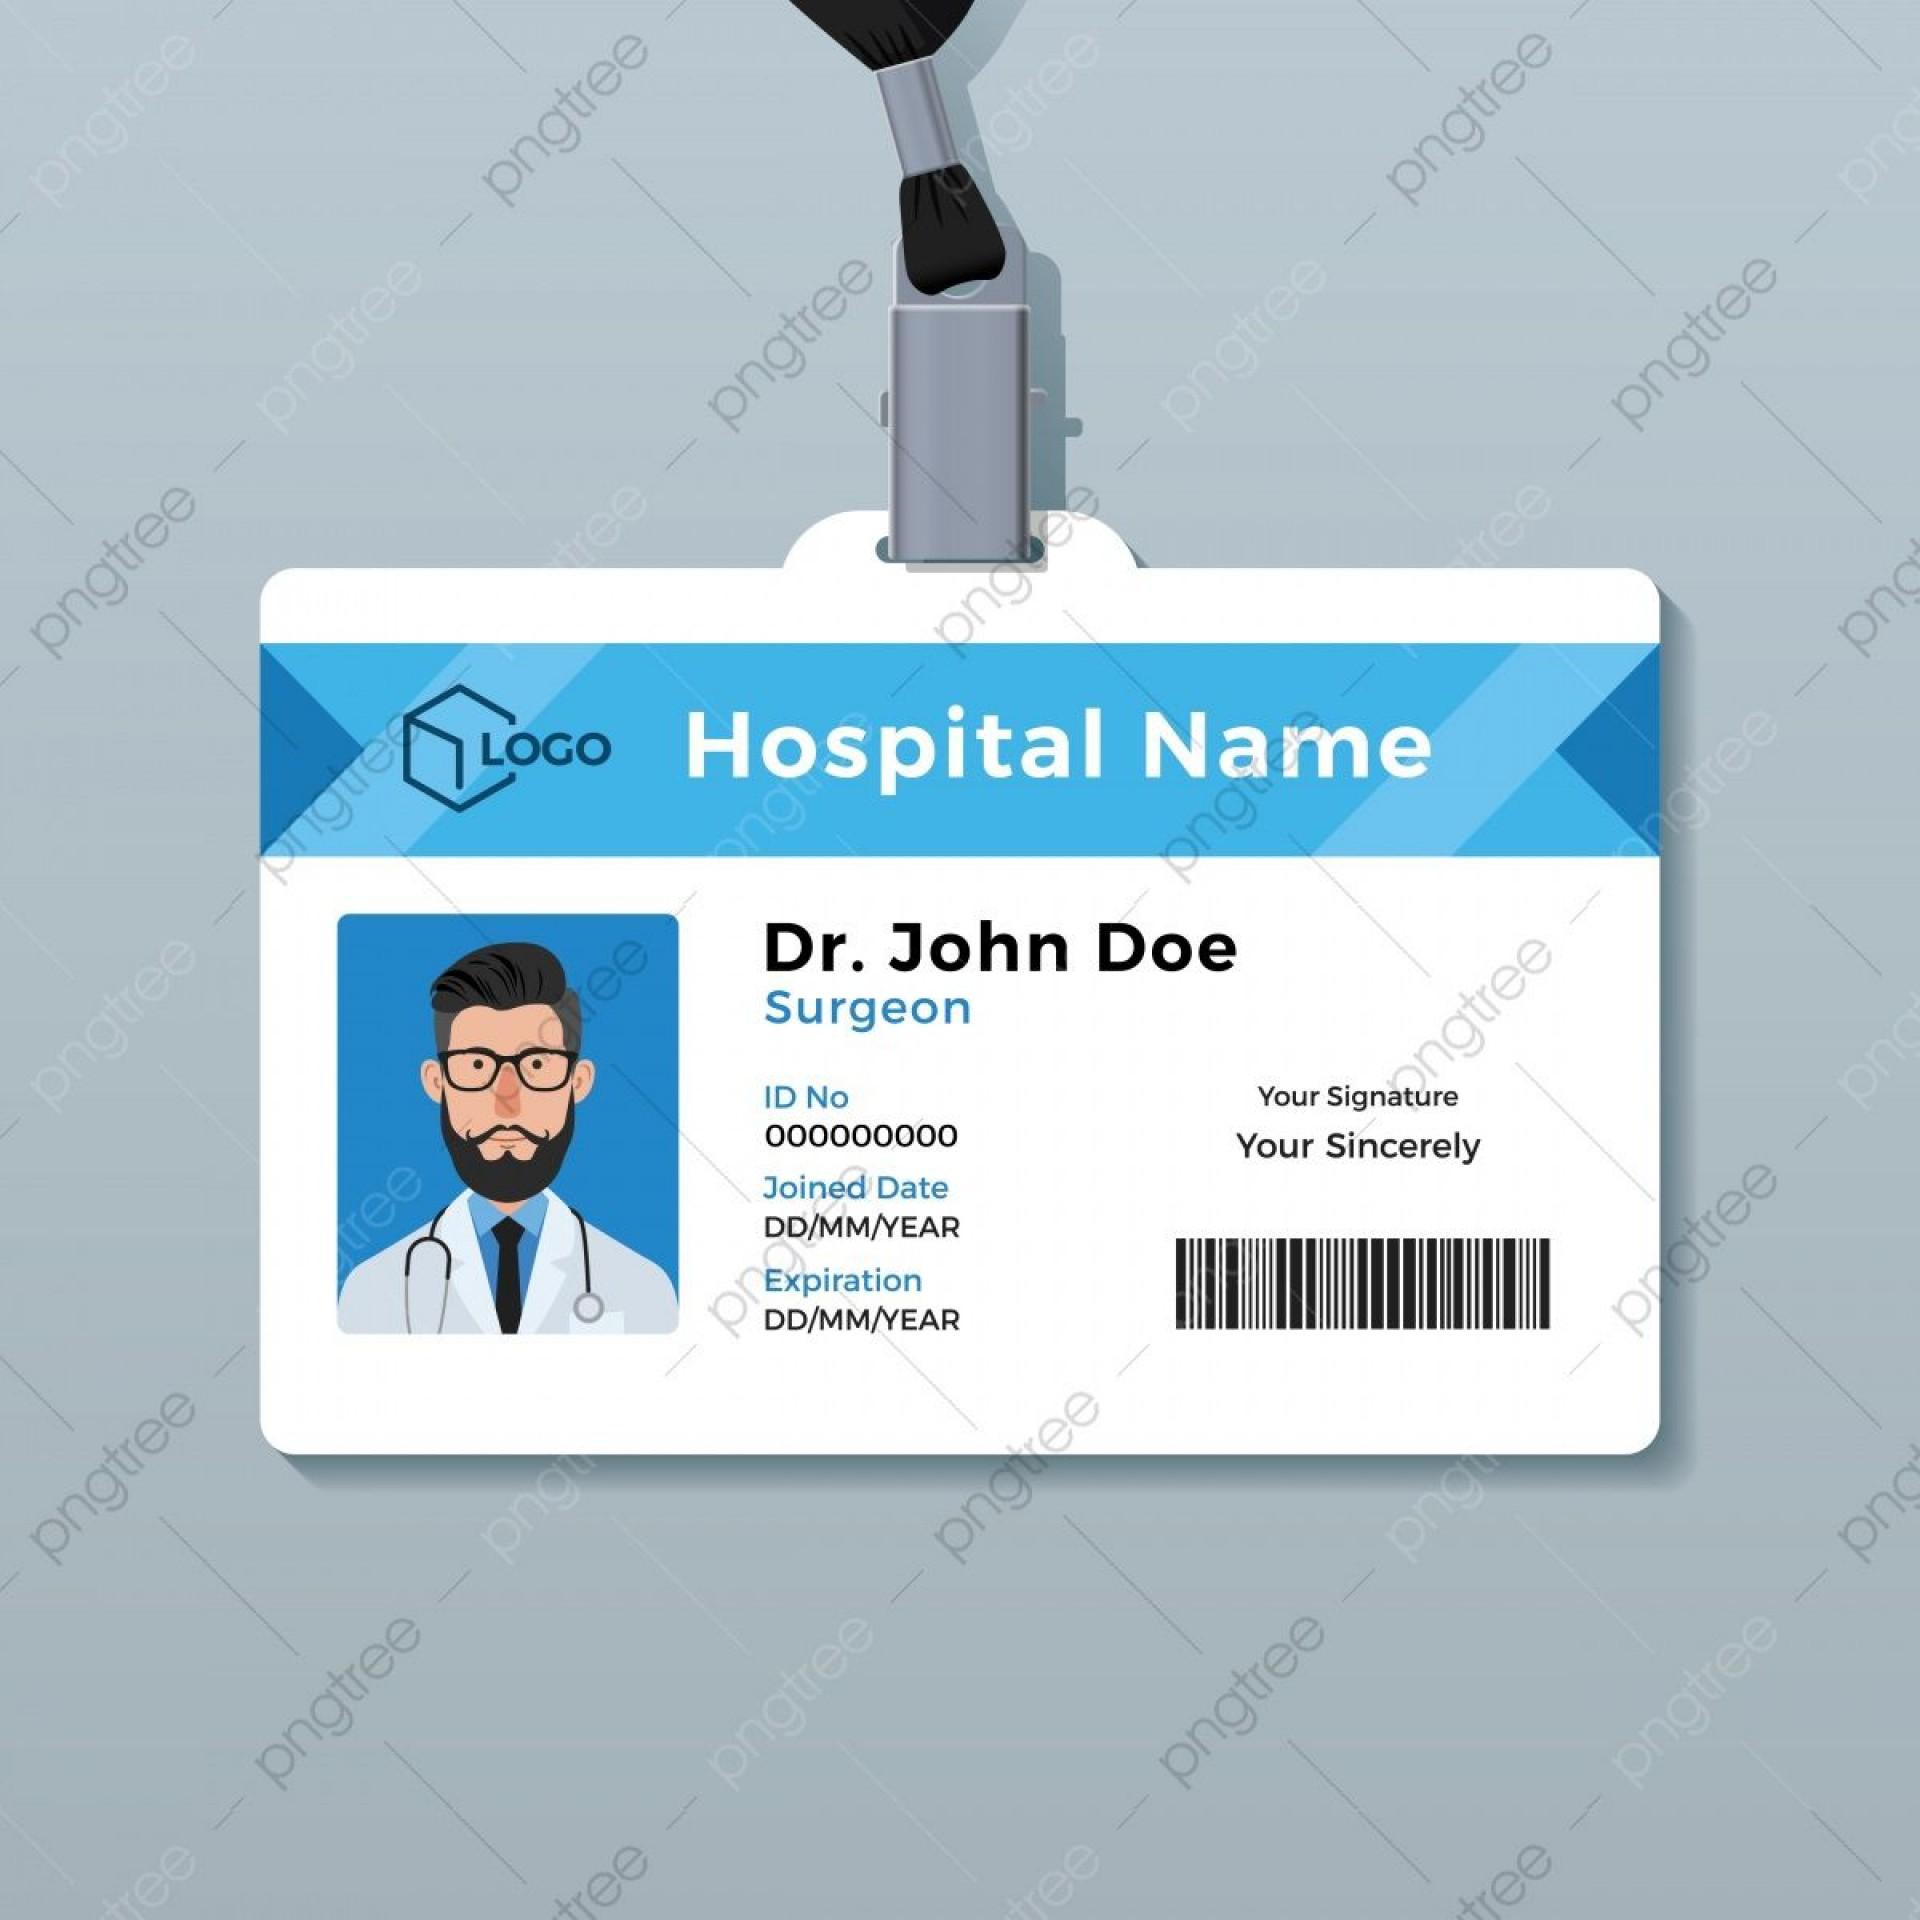 008 Exceptional Id Badge Template Free High Definition  School Teacher Jurassic Park1920